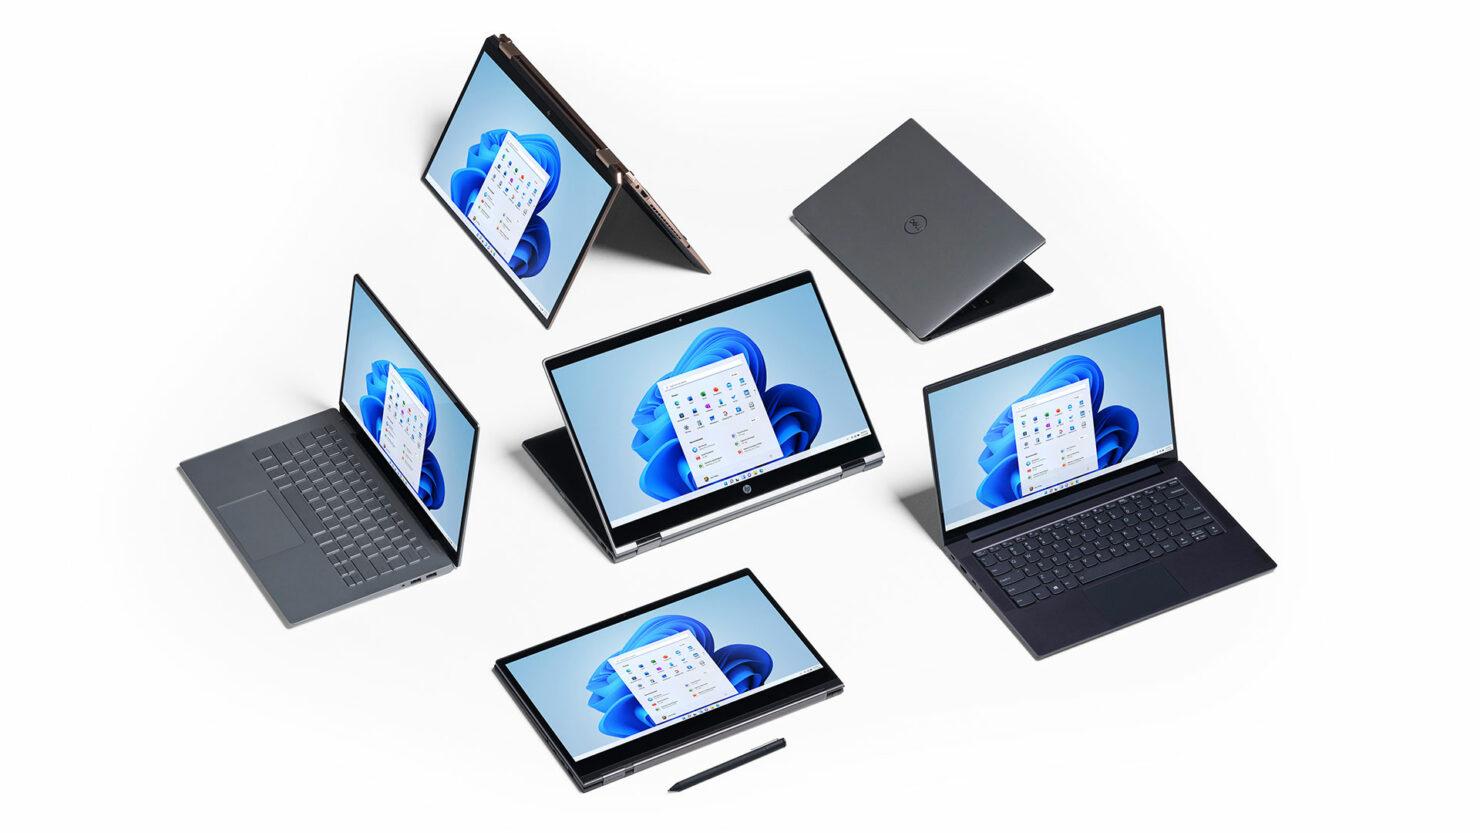 Windows 11 Dark Mode Windows 11 Build 22000.168